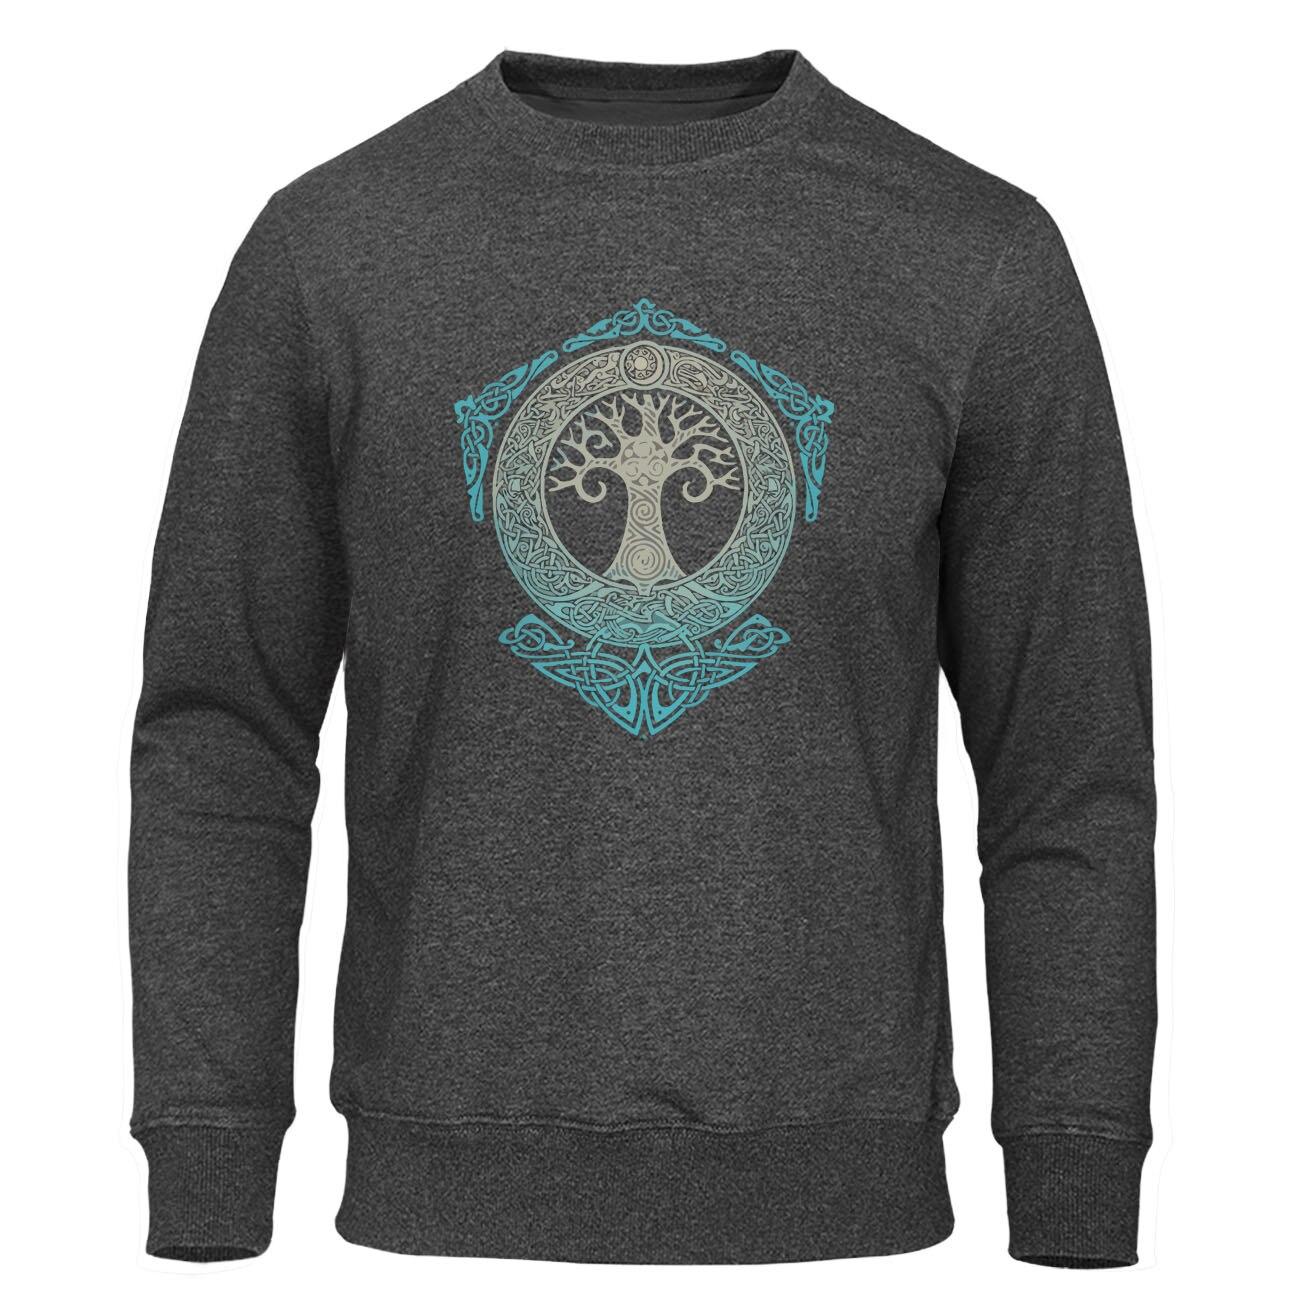 Yggdrasil Pullover Welt Baum Männer Warme Streetwear 2019 Winter Herbst Fleece Hoodies Odin Aesir Nordic Mythologie männer Sweatshirt